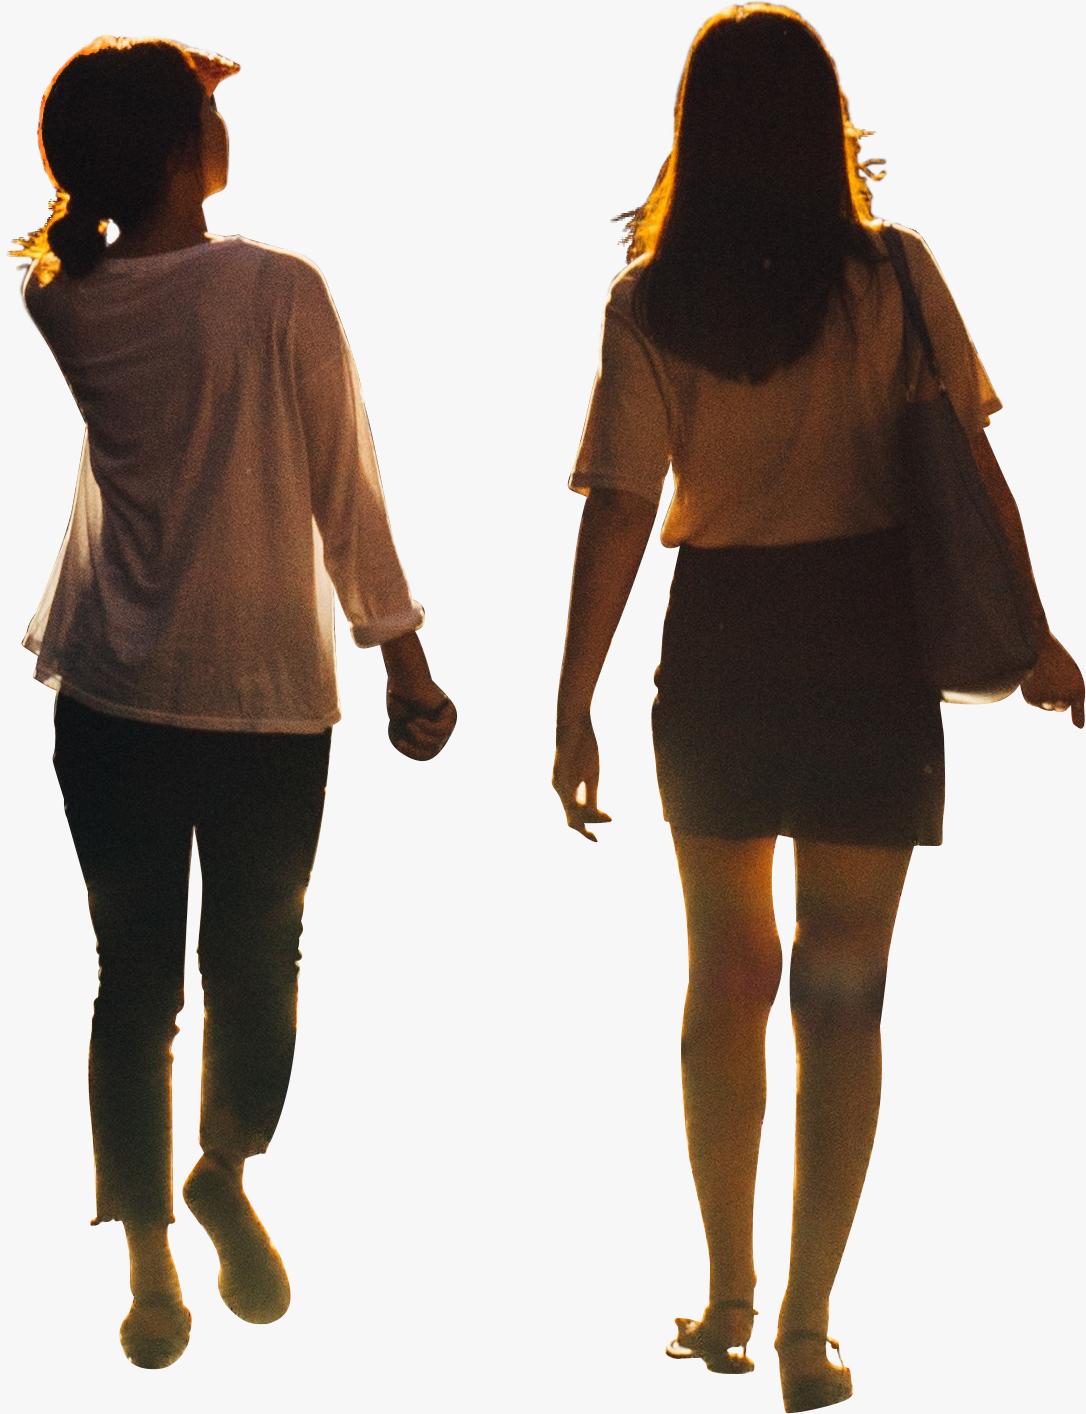 Girls Walking Png Ny Trip Girl Two Girls